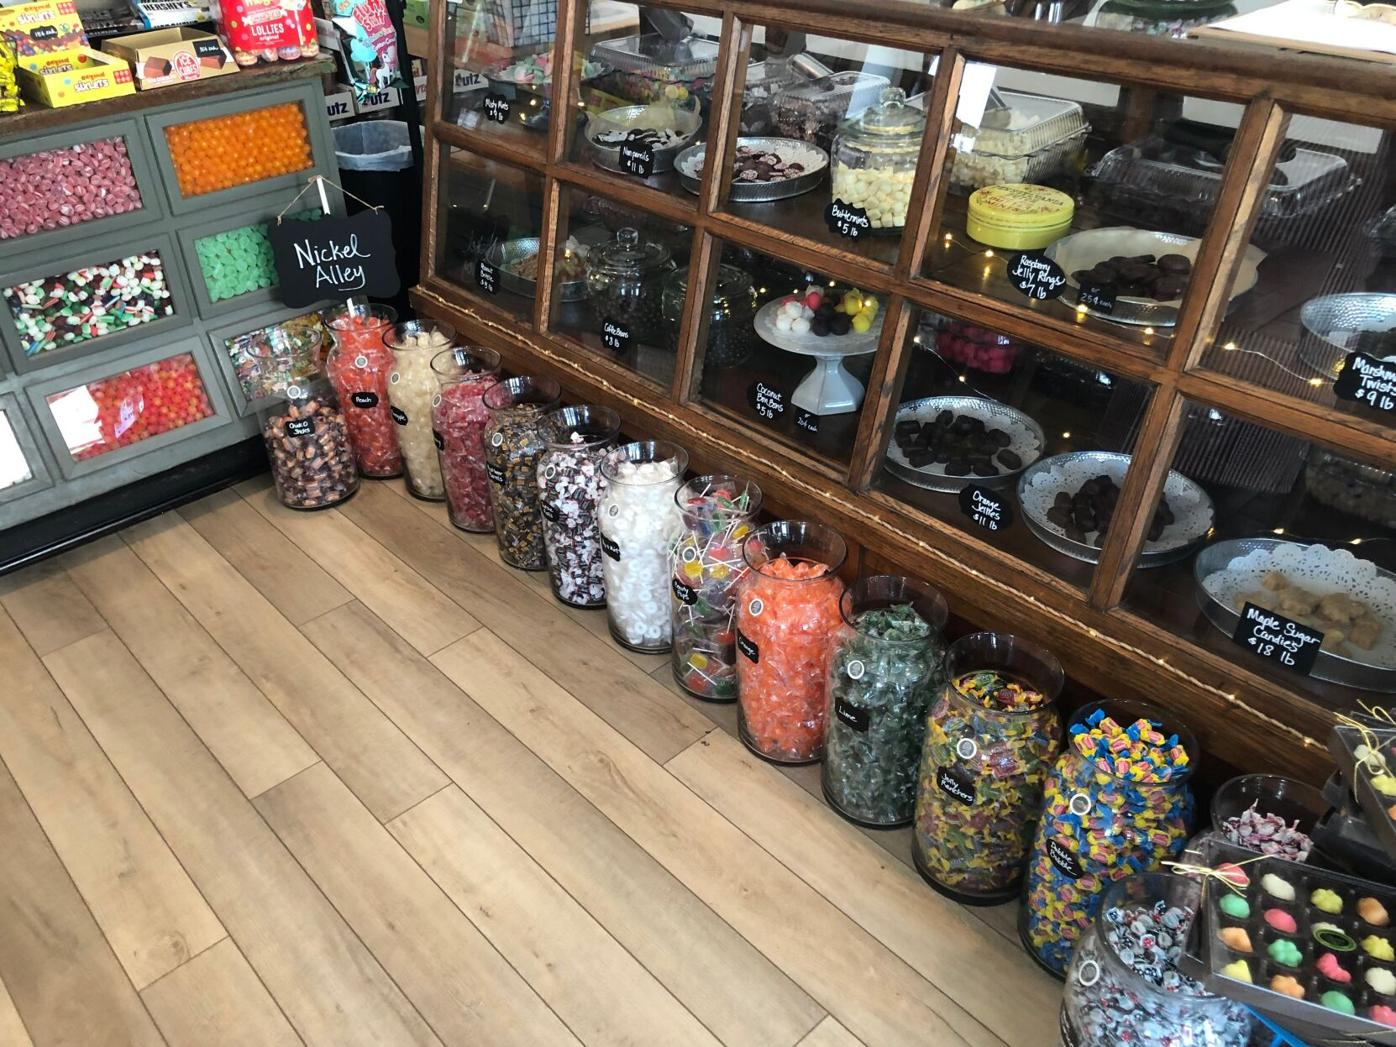 Lanc Candy Vintage Candy Nickel Alley.jpg